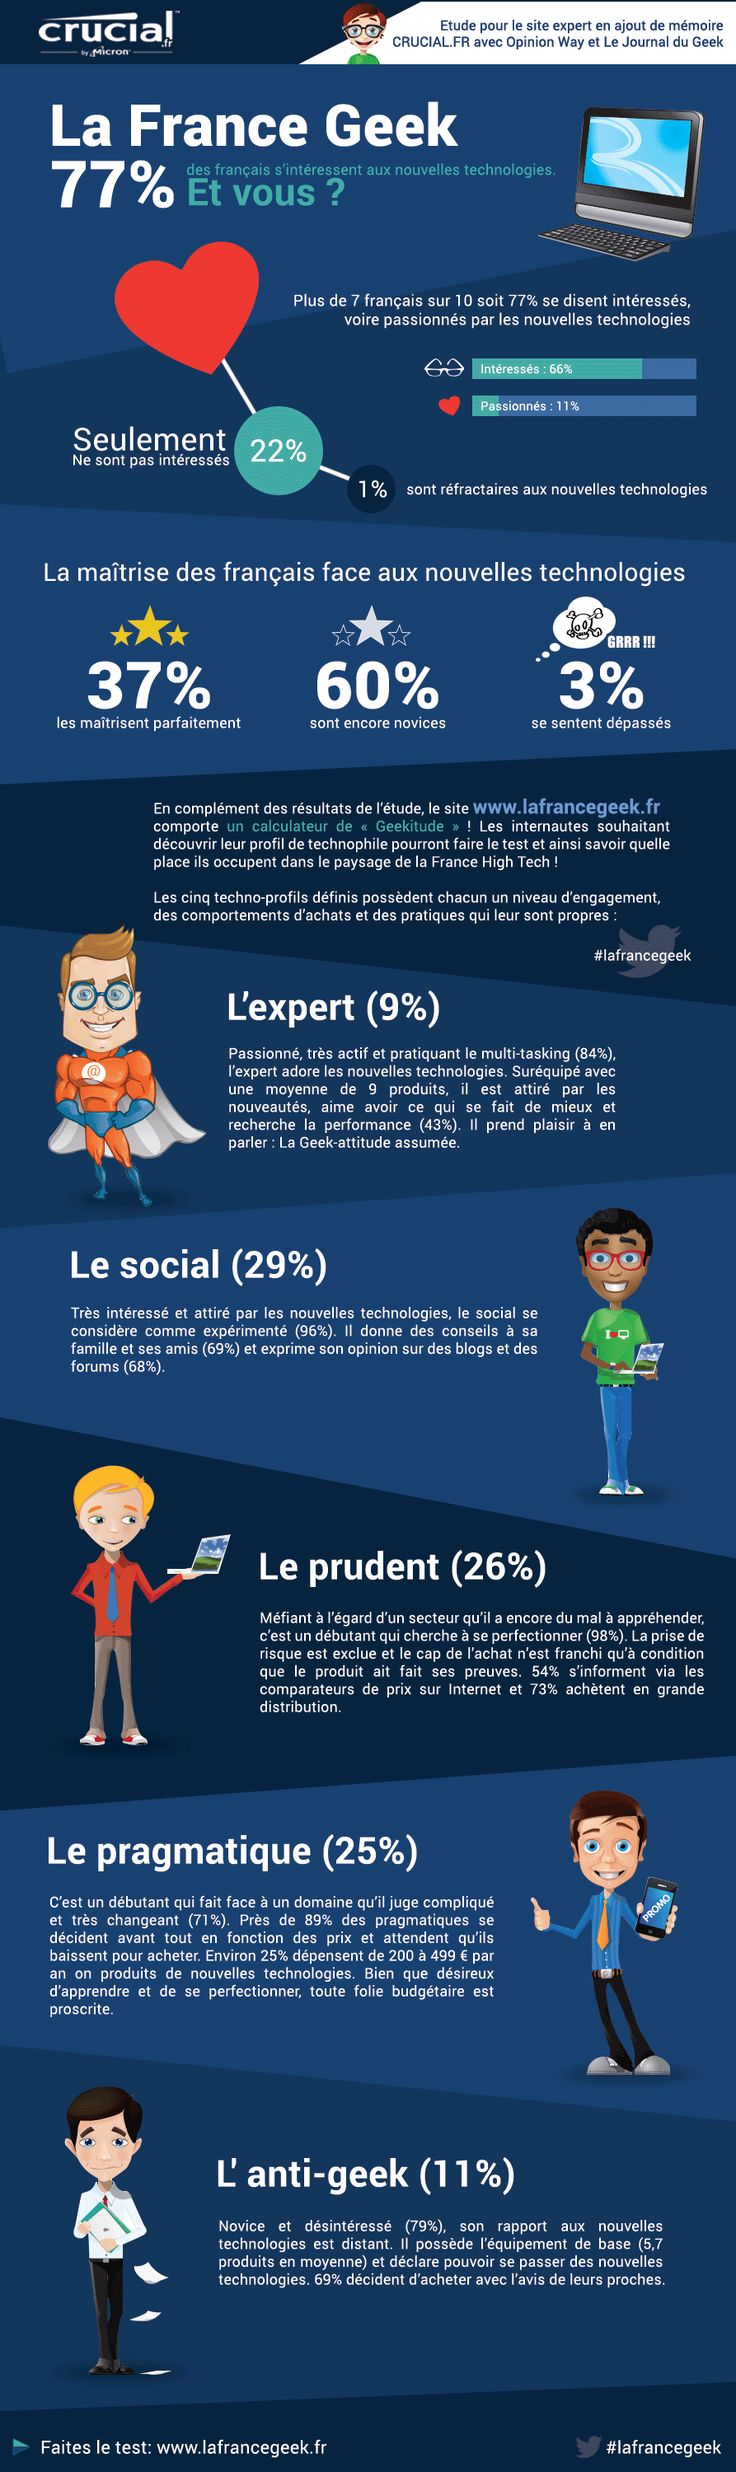 Infographie-Crucial.fr-la-France-geek2.gif 893×3,000 pixels